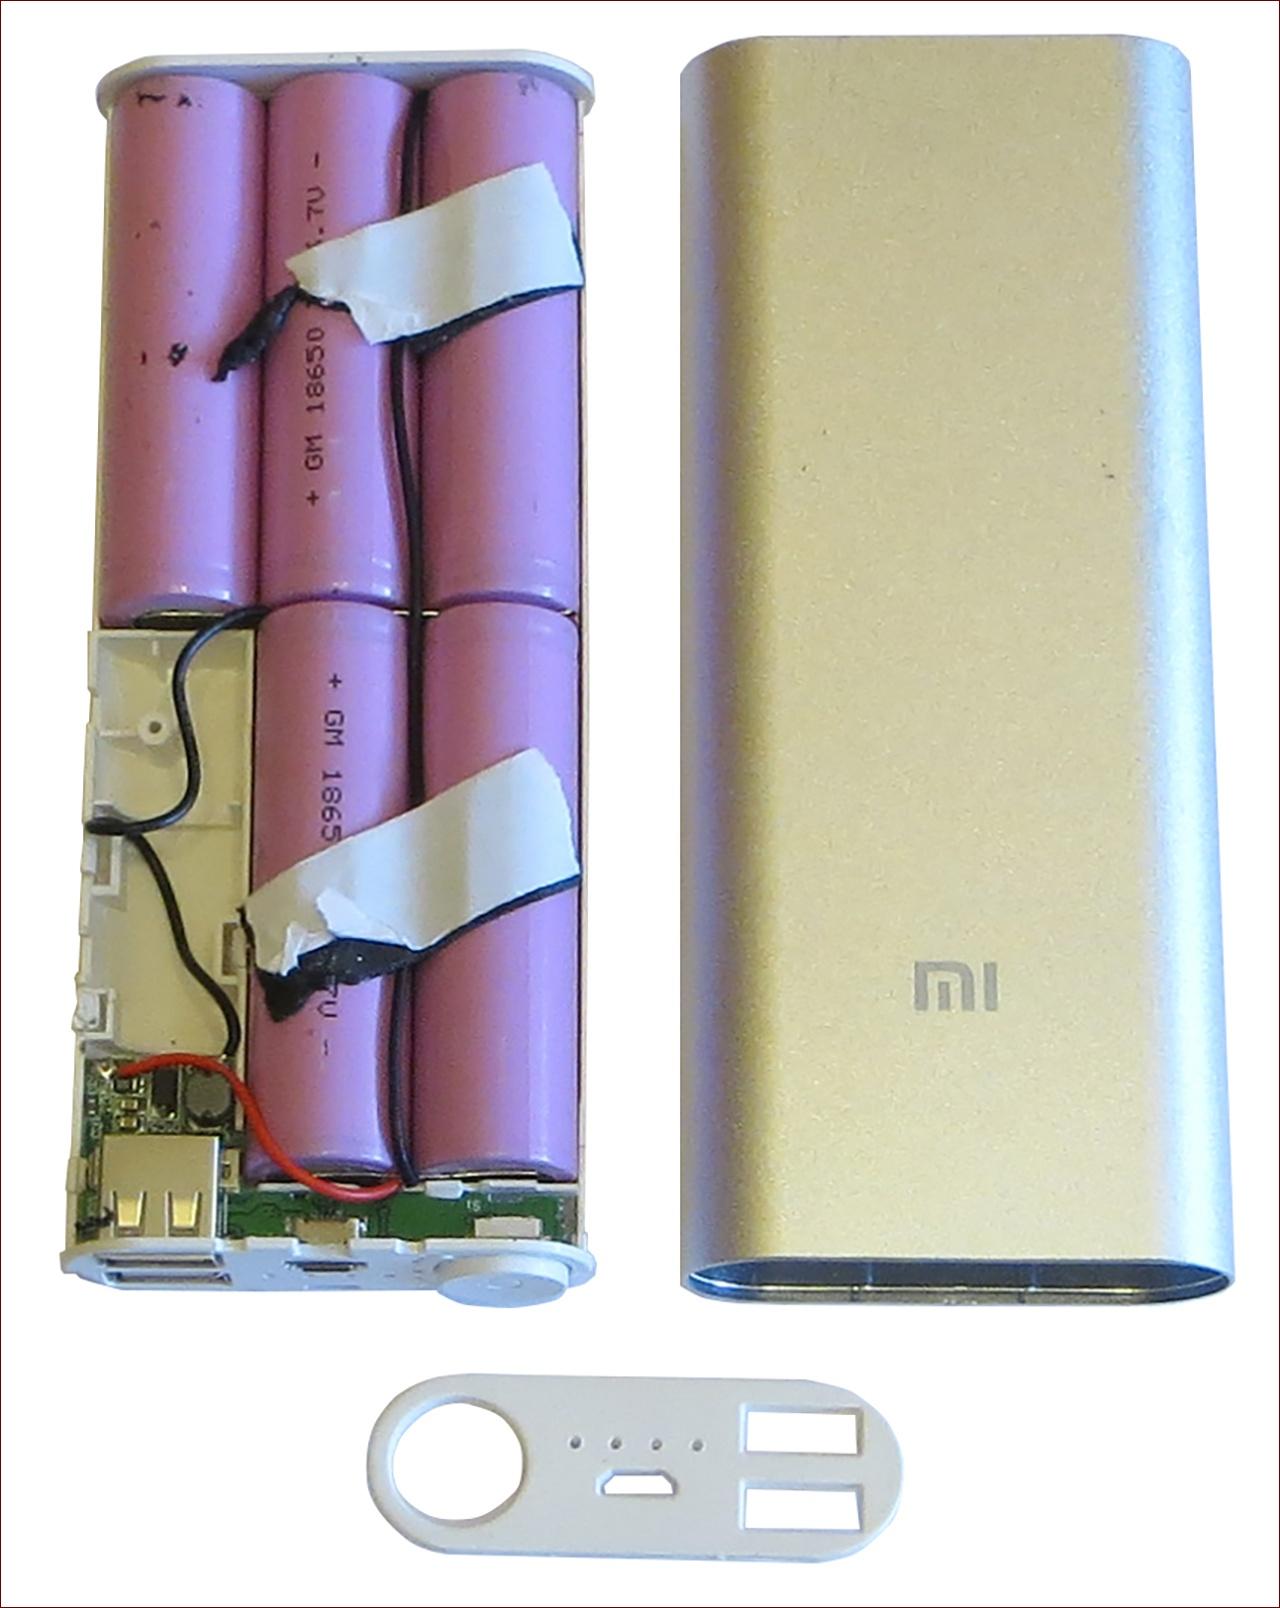 Внешние аккумуляторы HIPER и Xiaomi Mi — взгляд дилетанта - 60